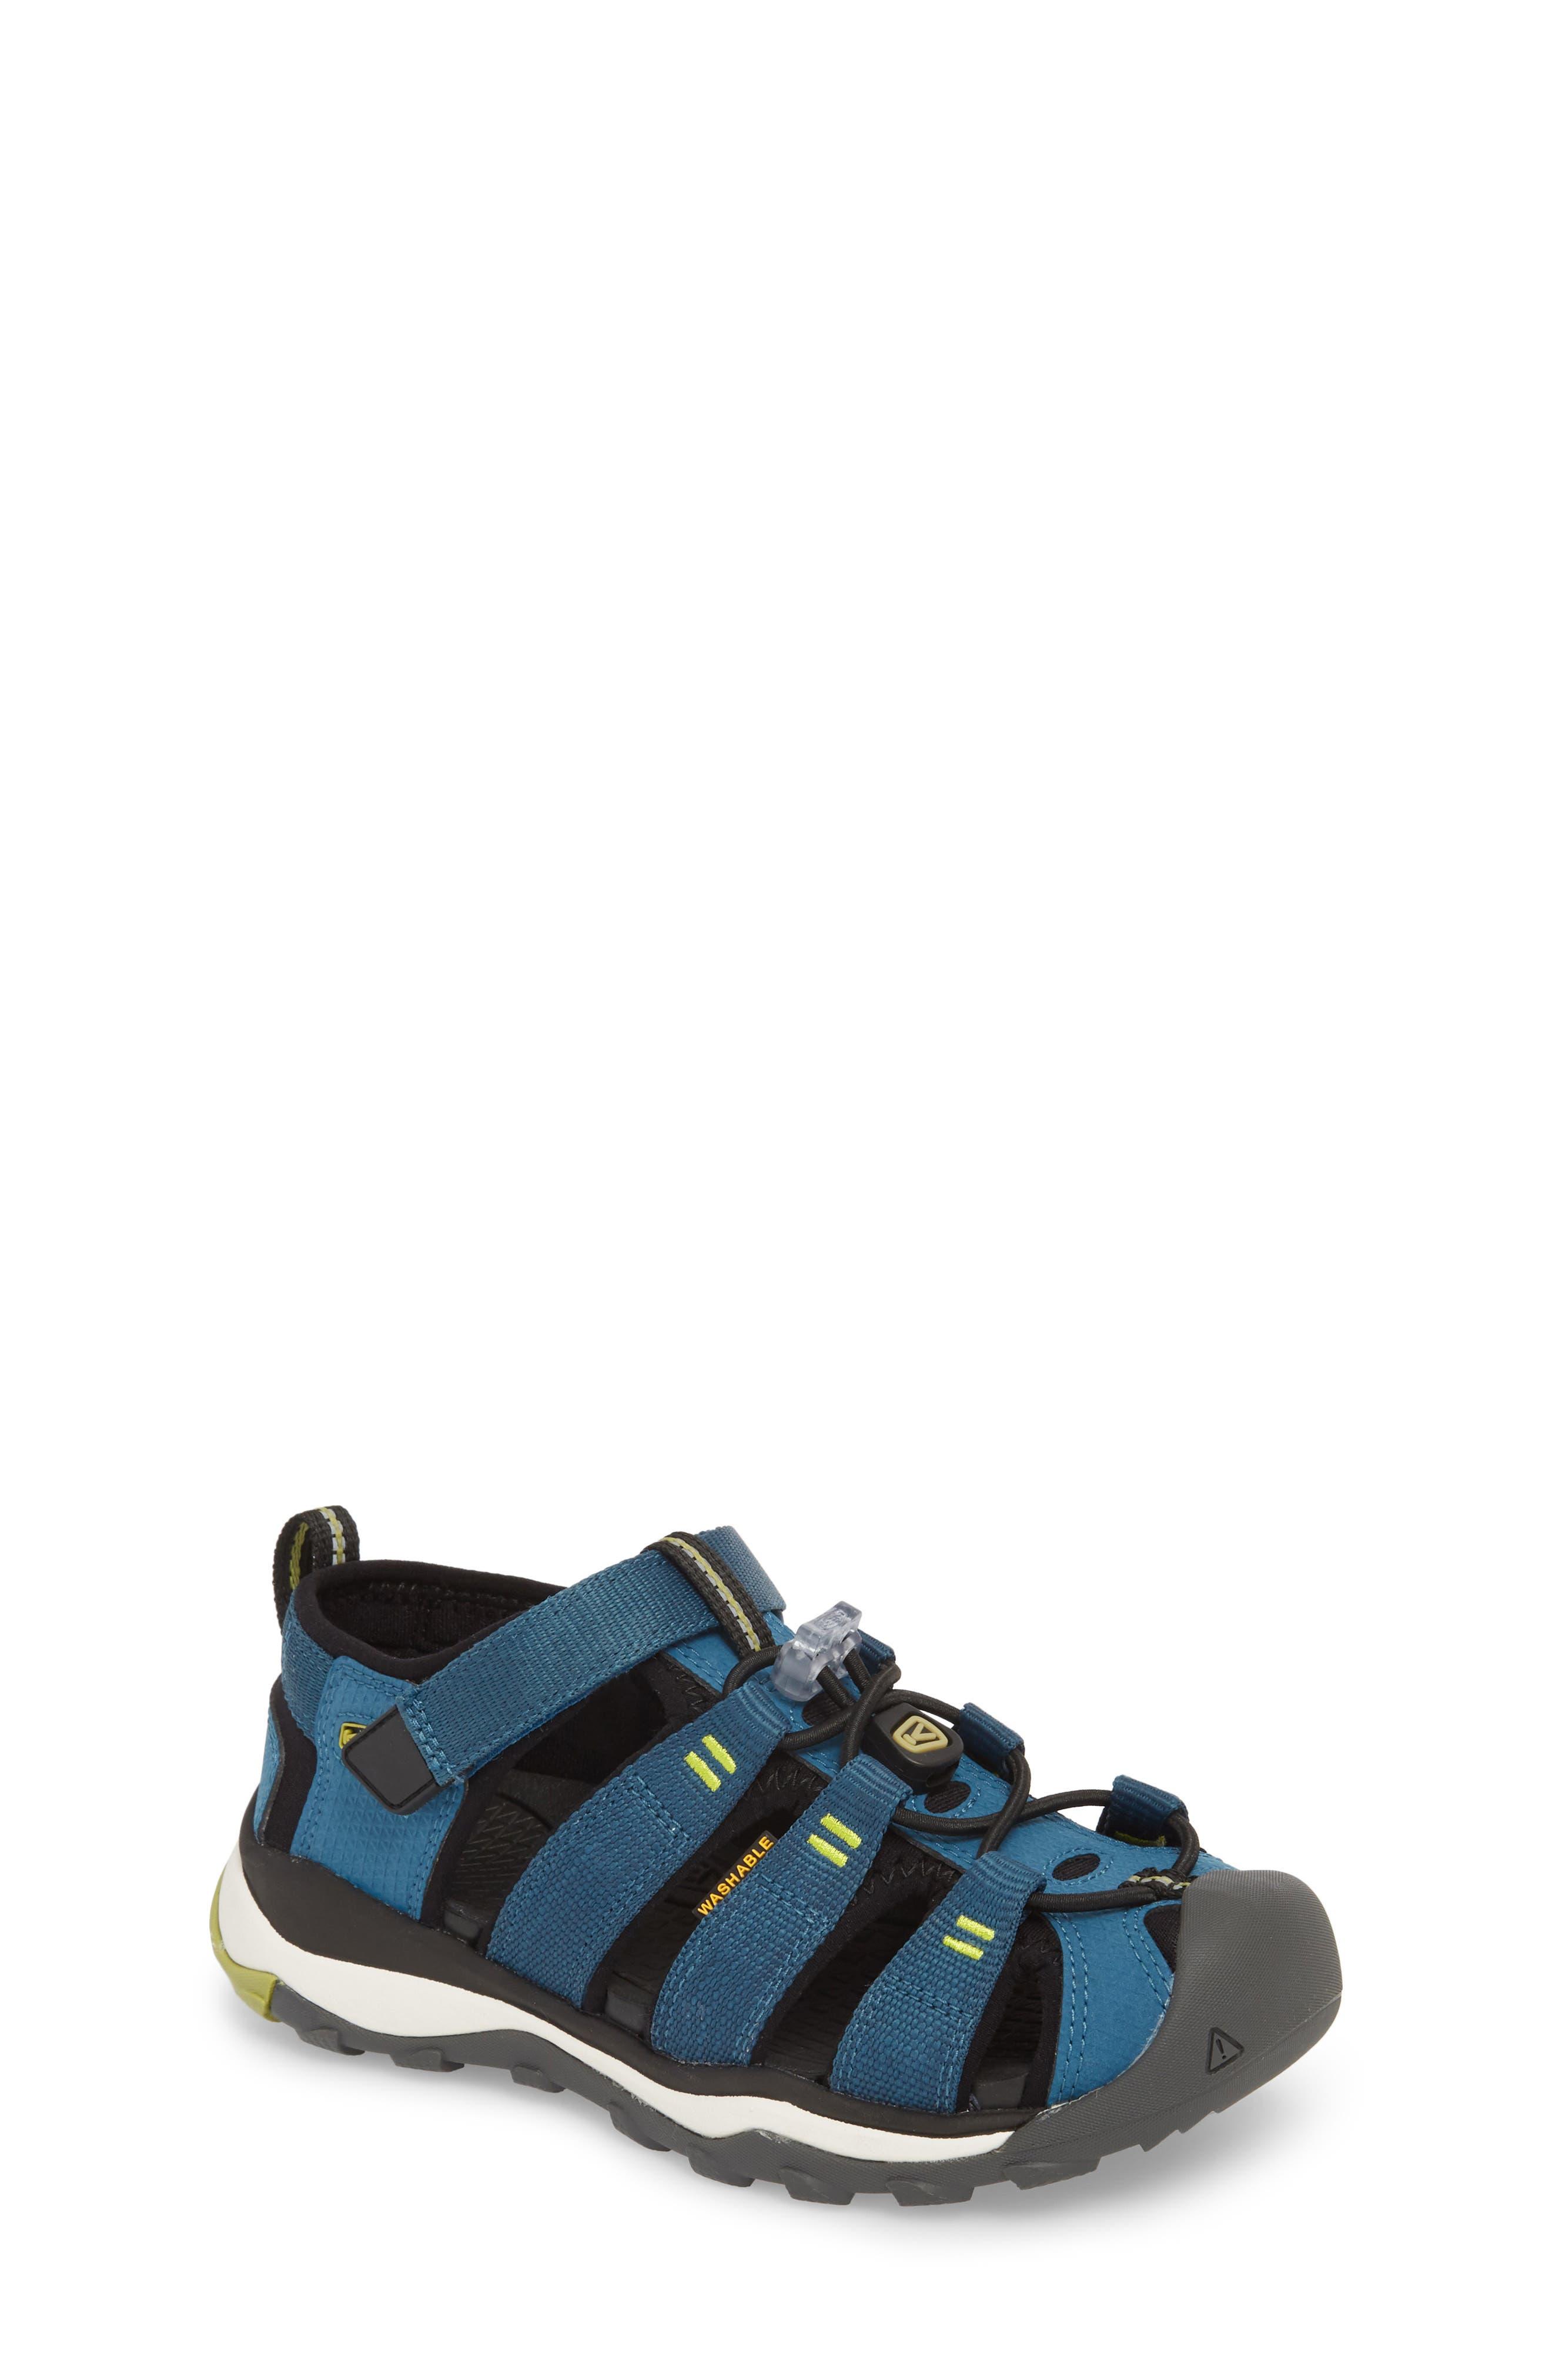 KEEN, Newport Neo H2 Water Friendly Sandal, Main thumbnail 1, color, LEGION BLUE/ MOSS